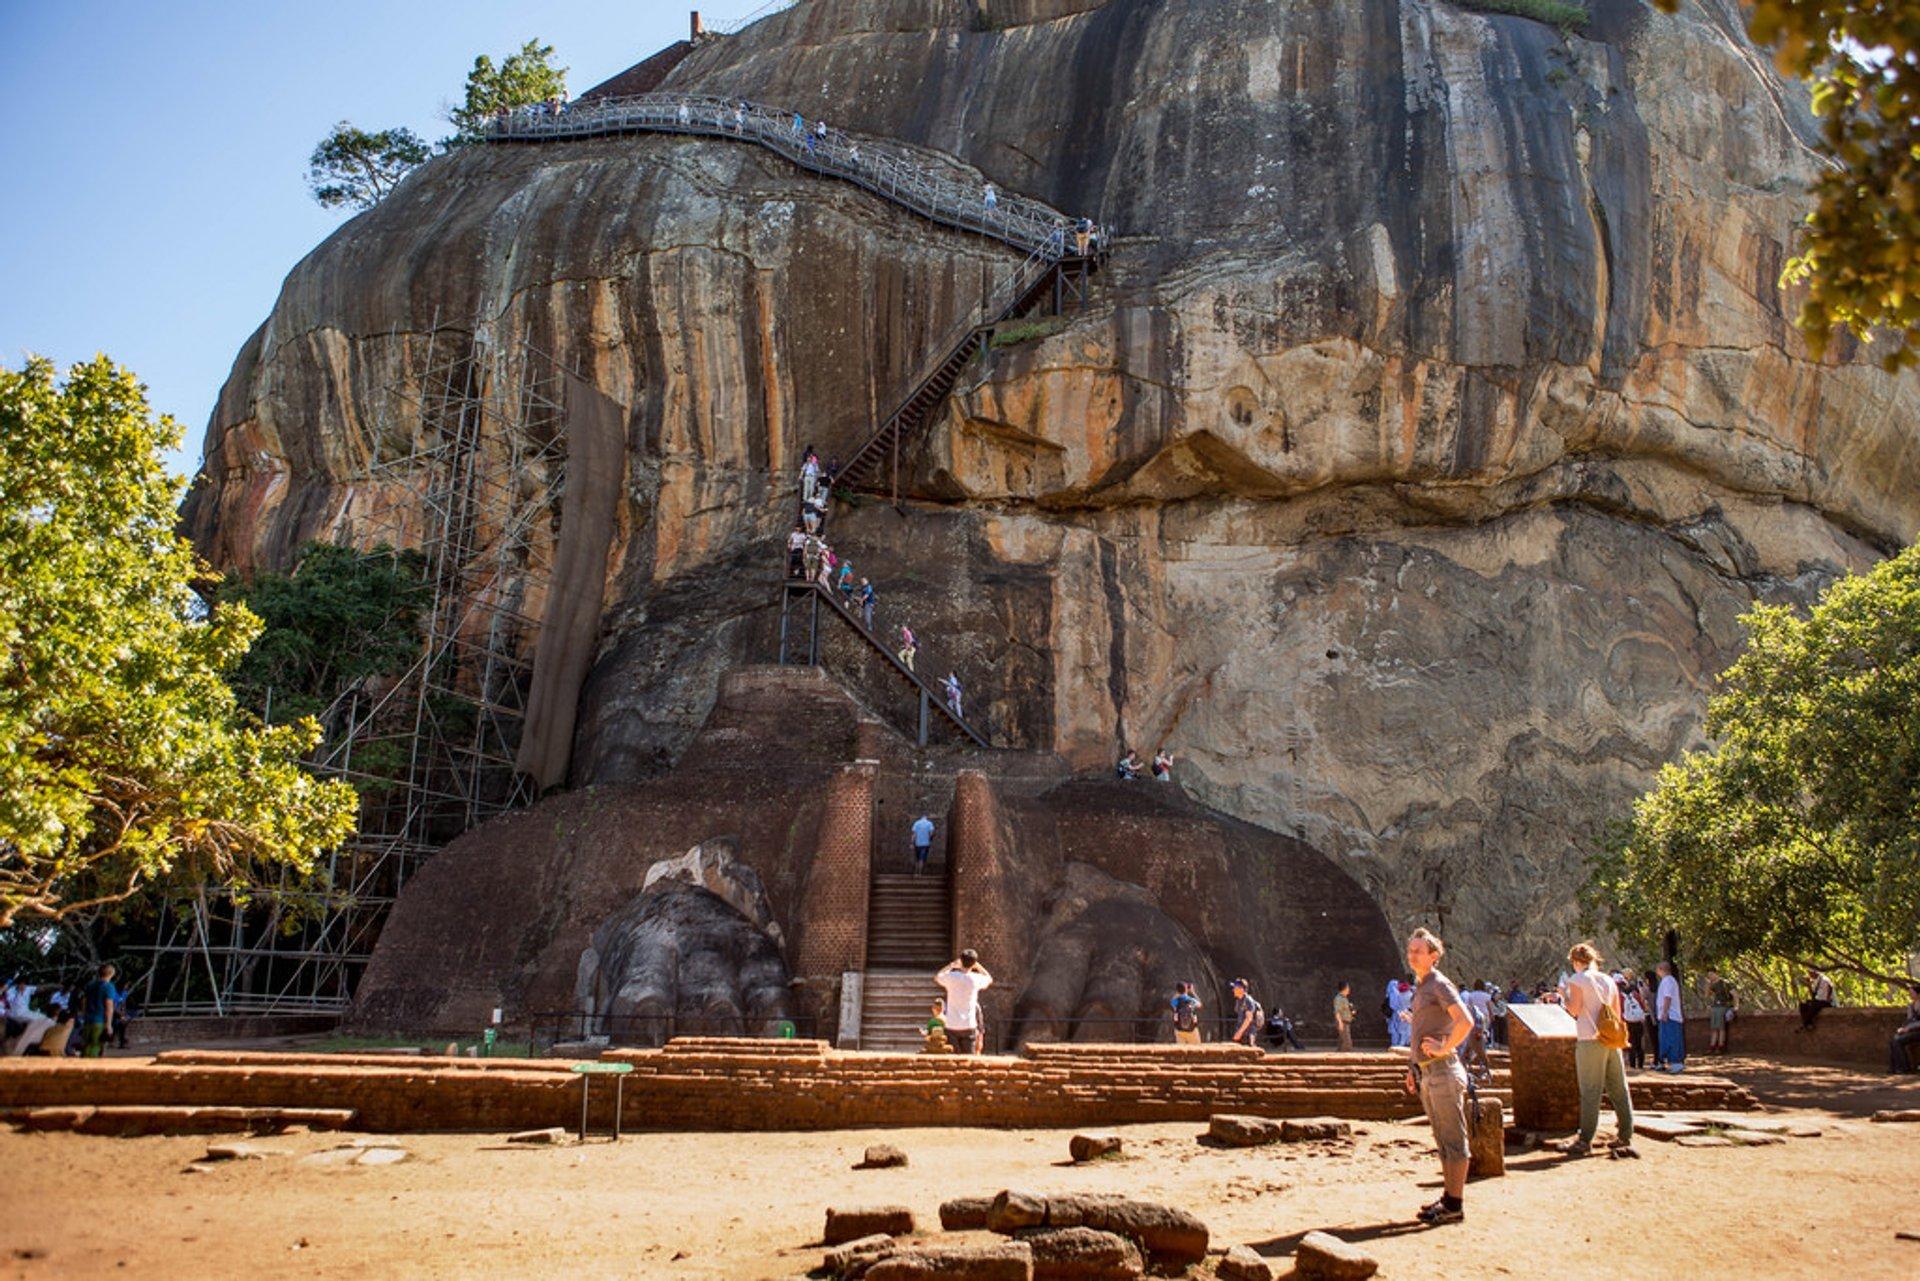 Sigiriya in Sri Lanka 2020 - Best Time